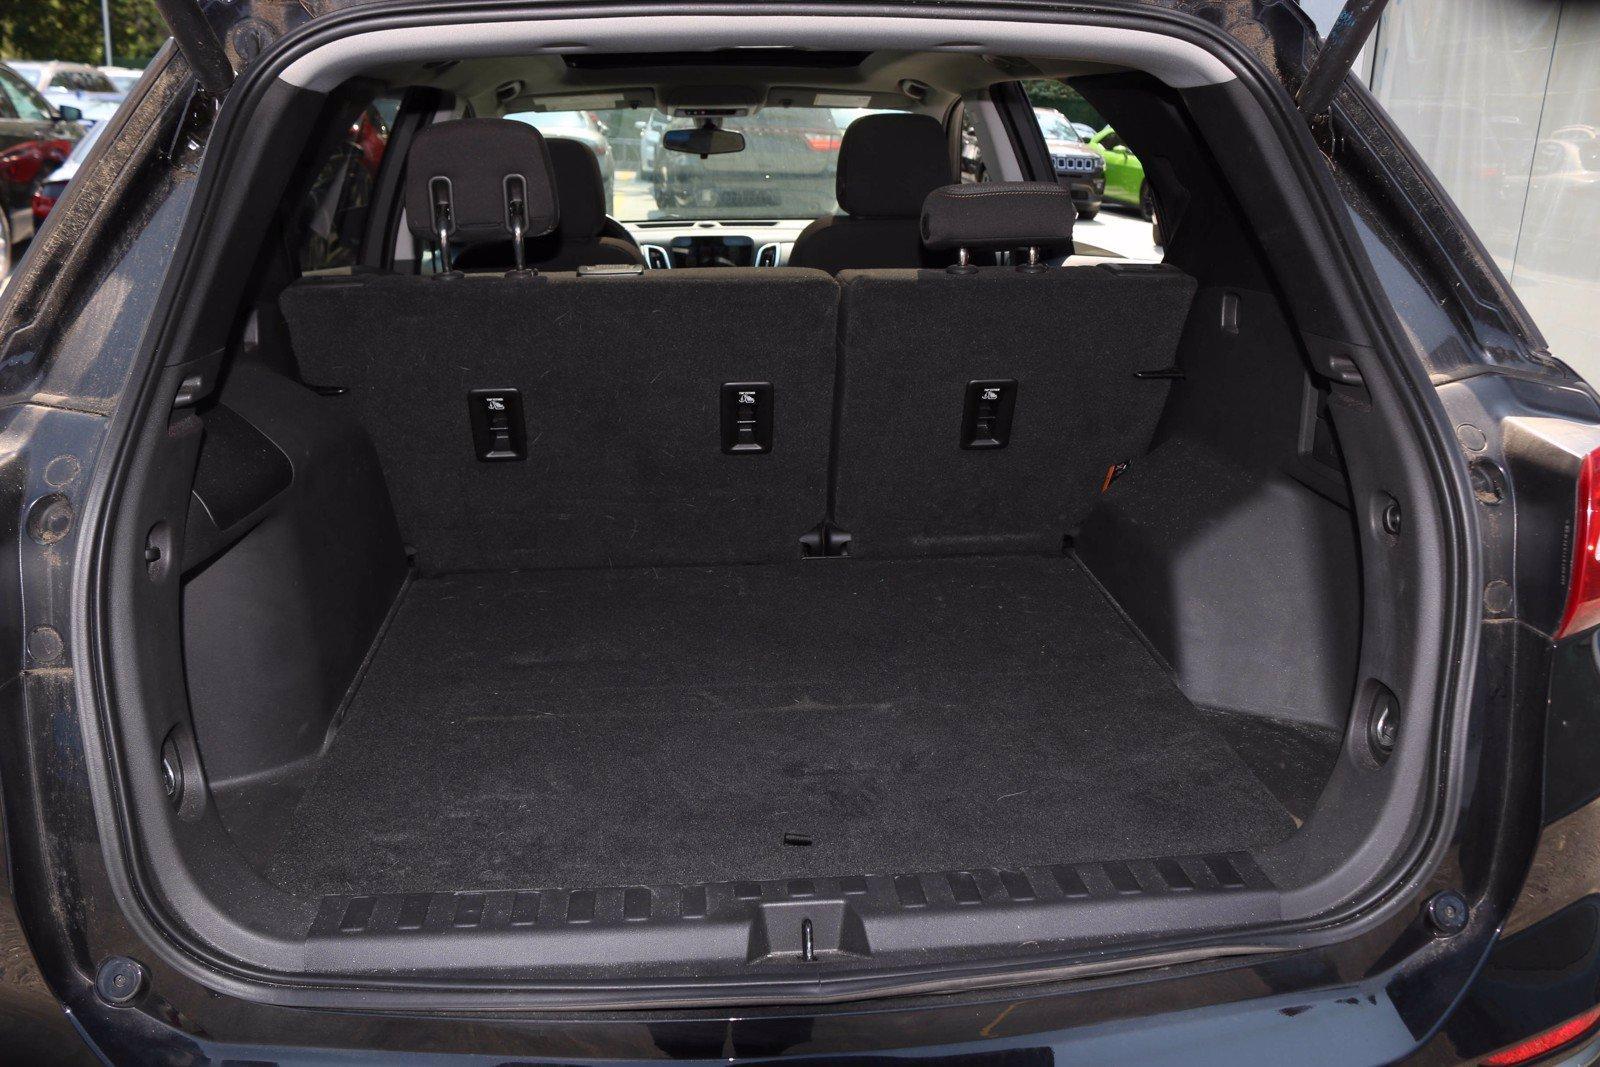 Used-2018-Chevrolet-Equinox-LT